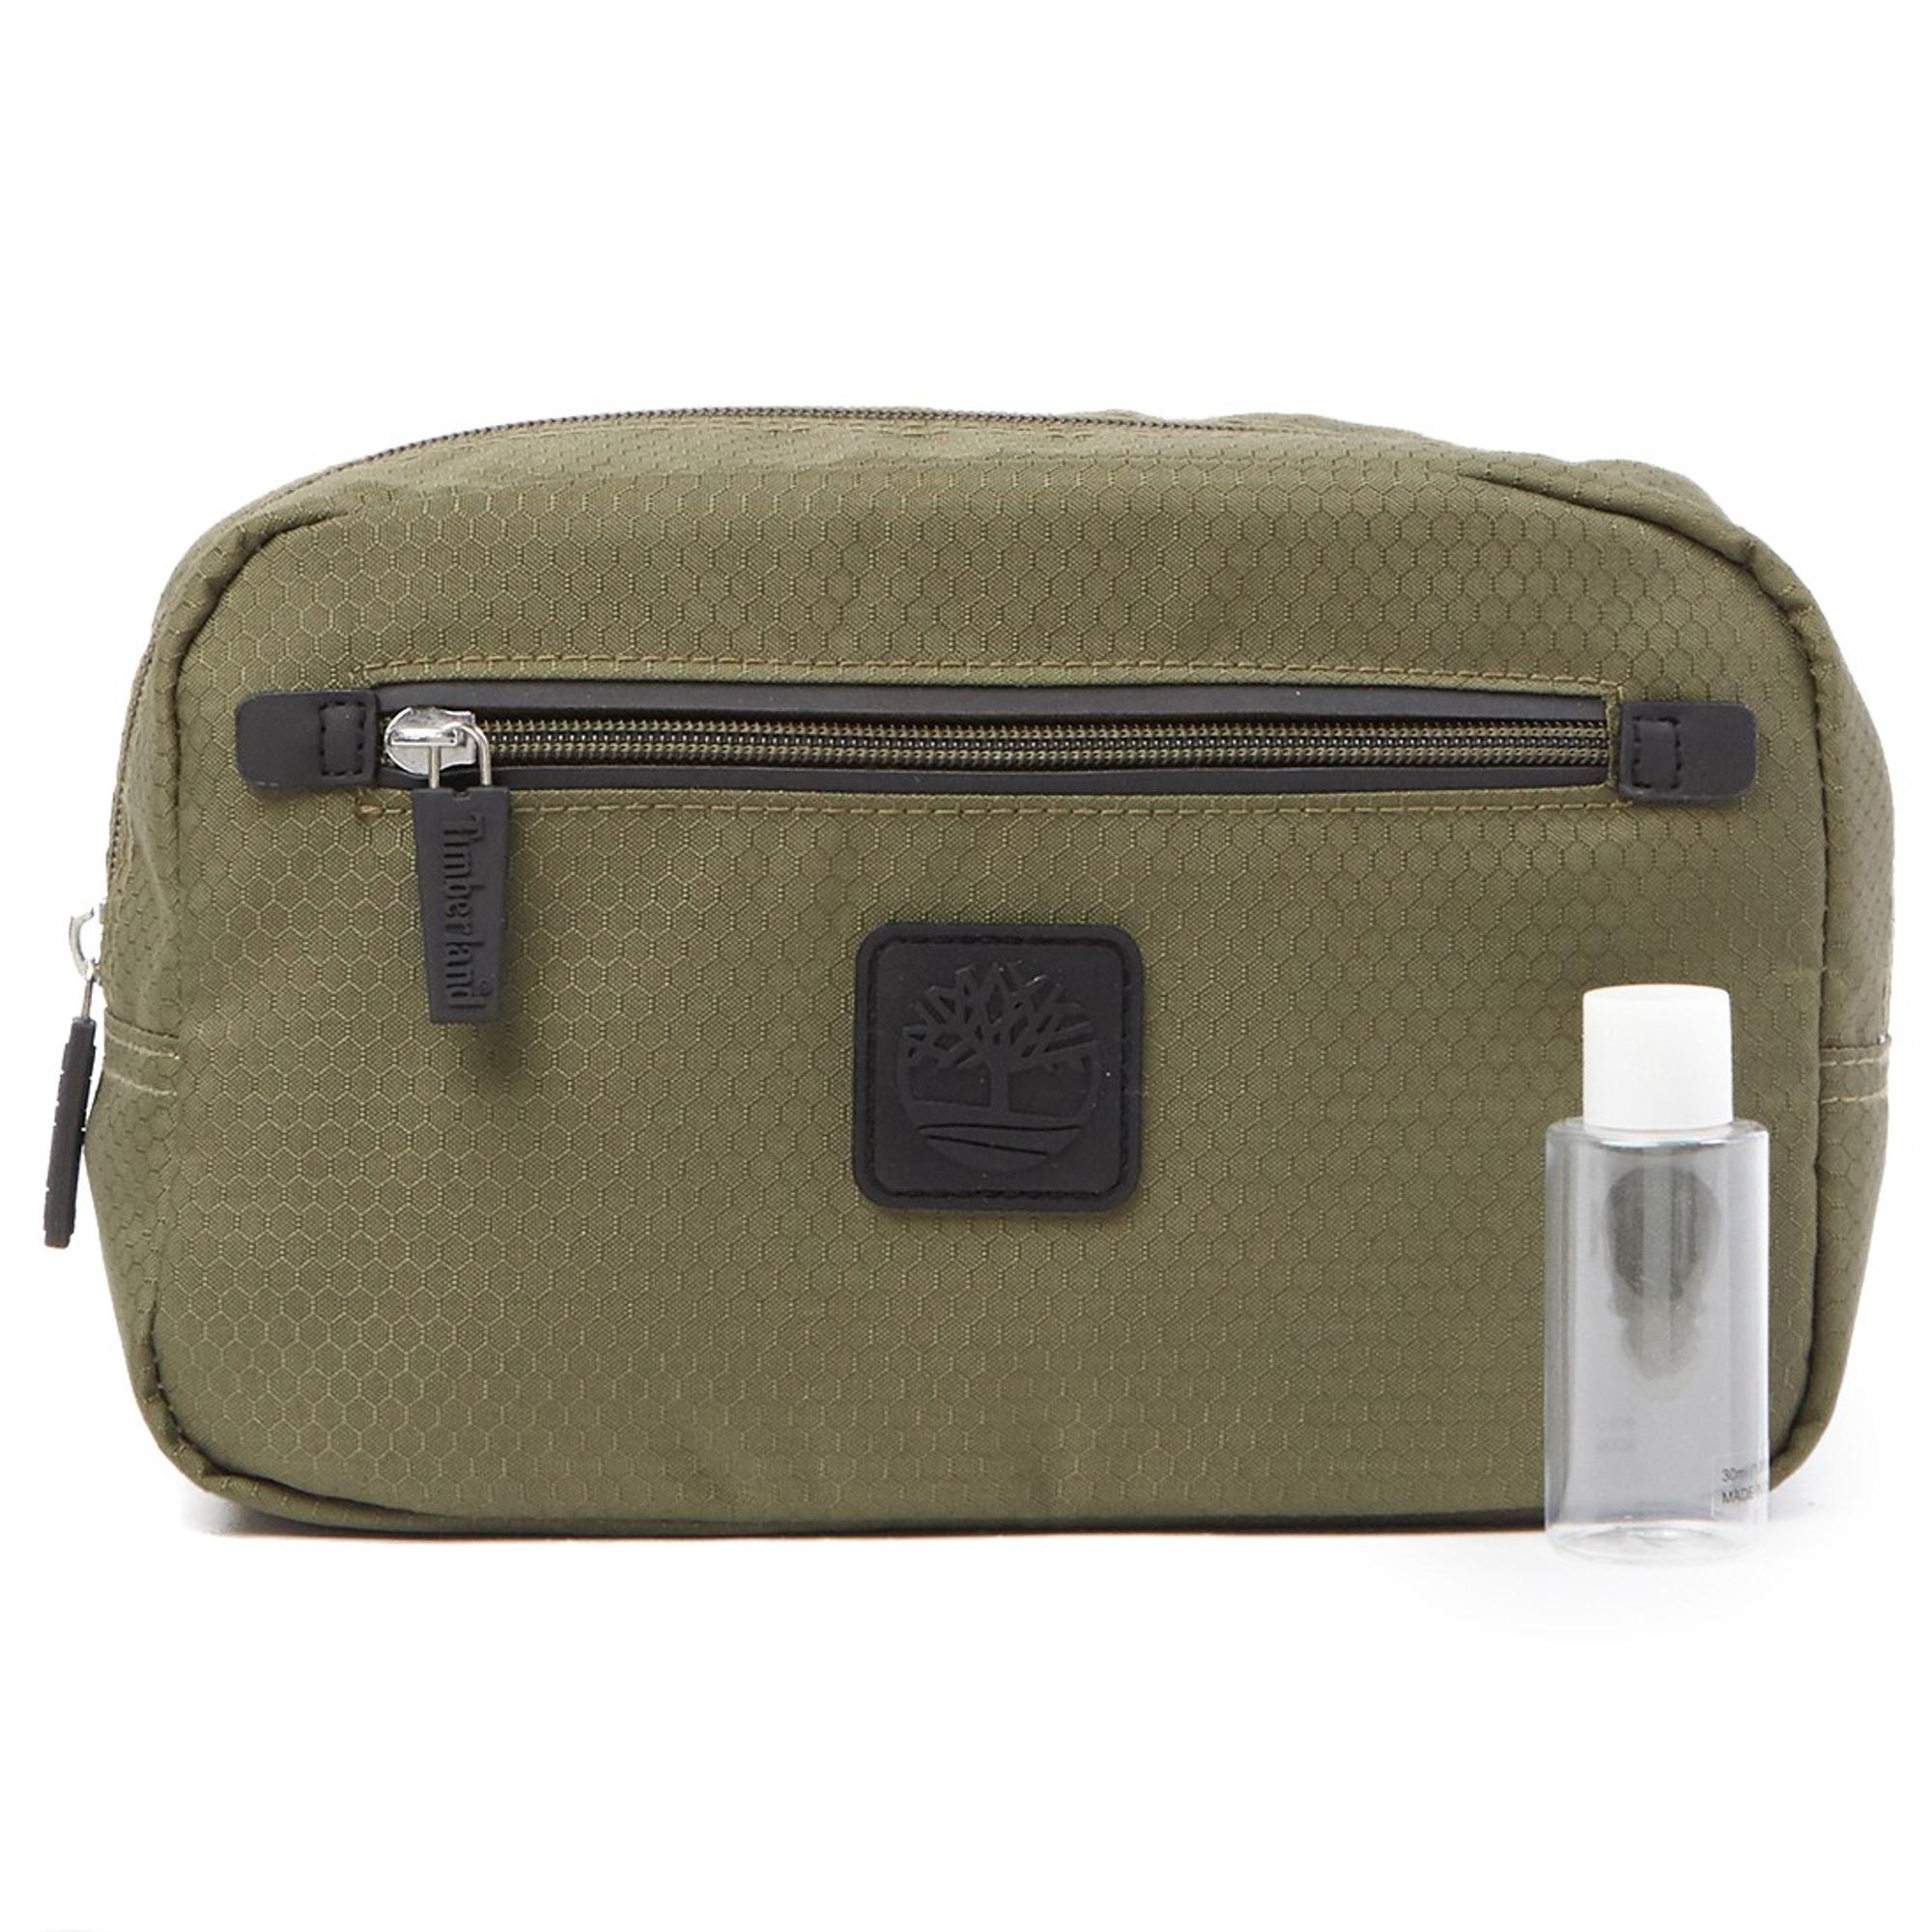 e299407301 Timberland Mens Shave Kit Travel Organizer Dopp Kit Overnight Toiletry Bag